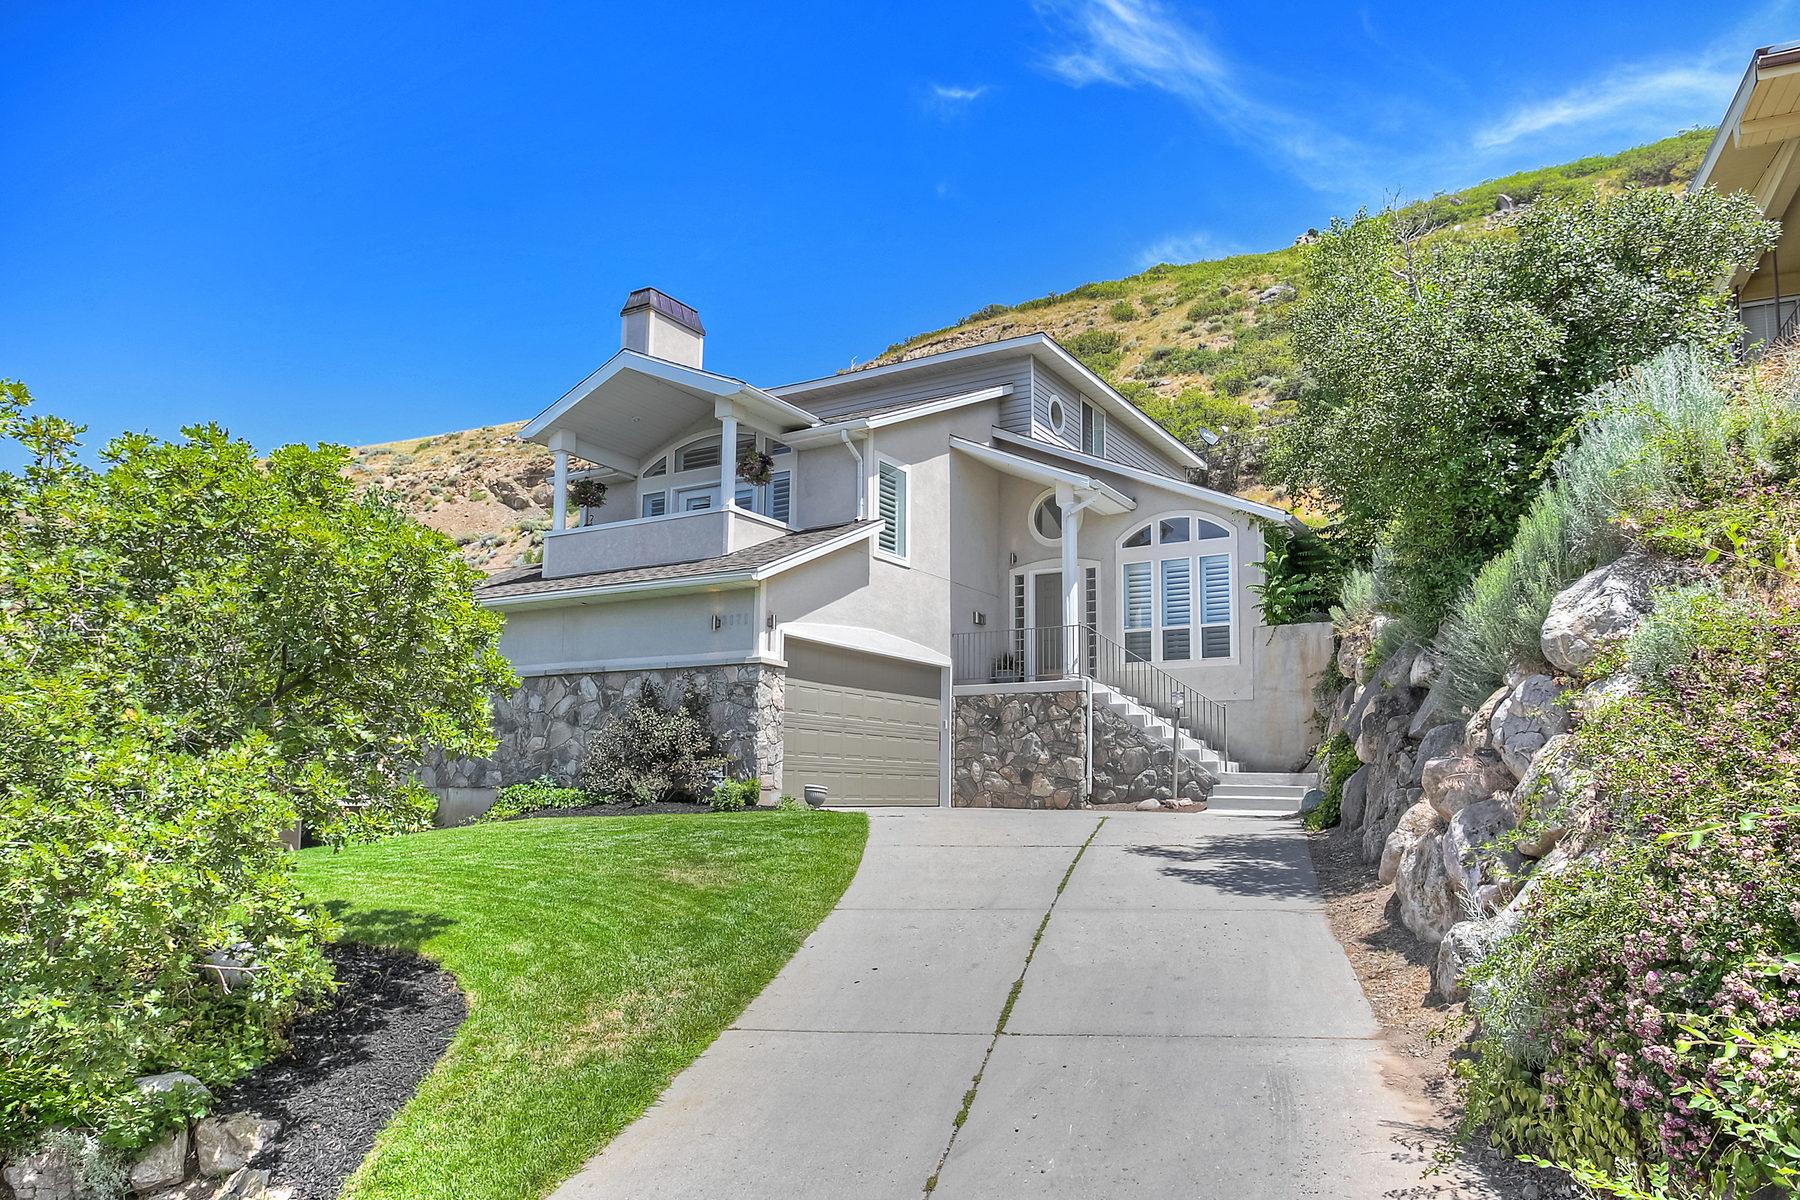 Villa per Vendita alle ore Clean and Crisp Mountain Contemporary 3171 Teton Dr Salt Lake City, Utah 84109 Stati Uniti